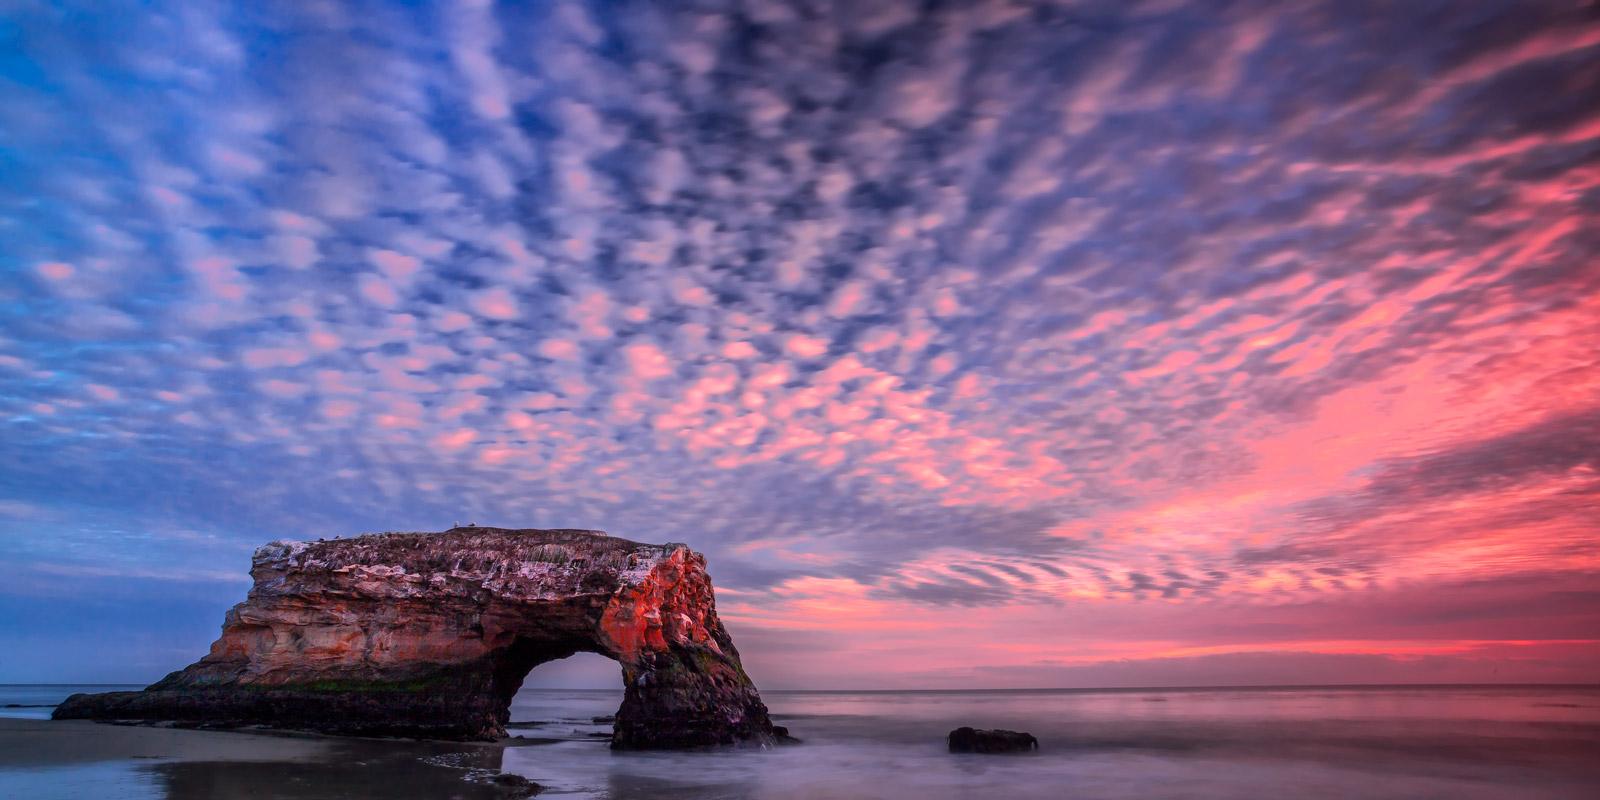 California, Santa Cruz, Natural Bridge, Sunset, Coast, limited edition, photograph, fine art, landscape, photo